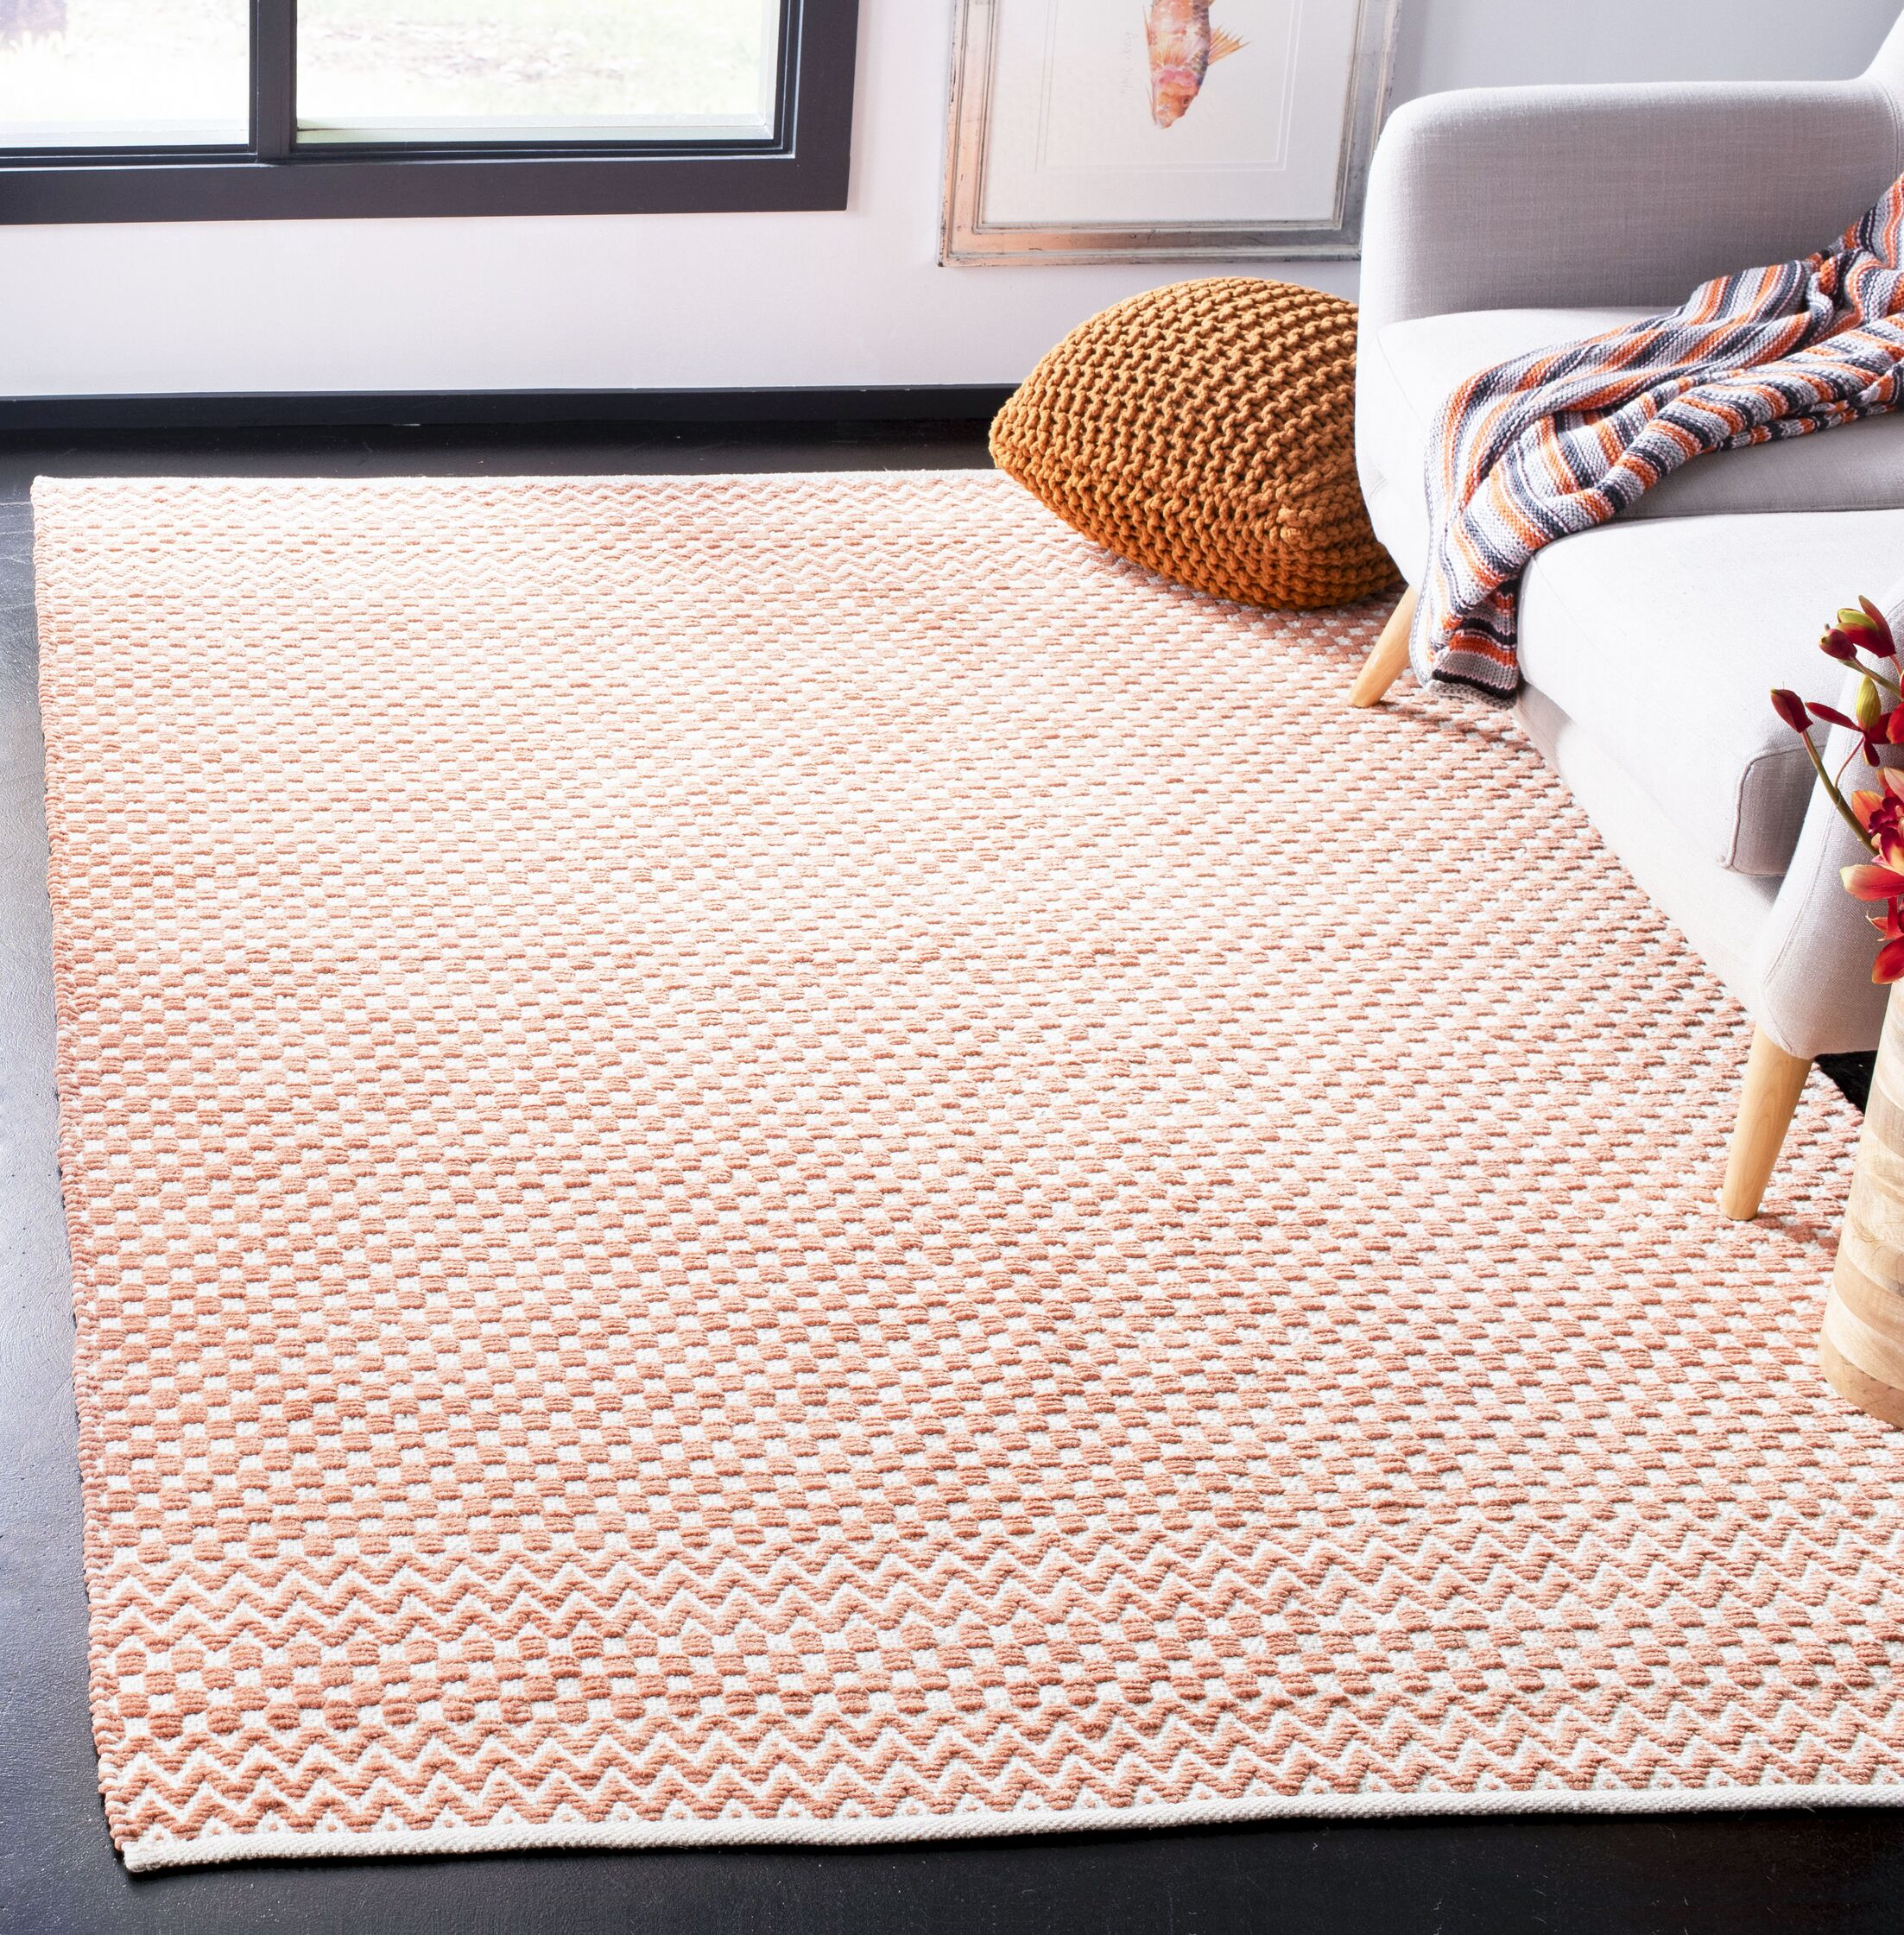 Redbrook Hand-Tufted Cotton Orange Area Rug Rug Size: Rectangle 6' x 9'